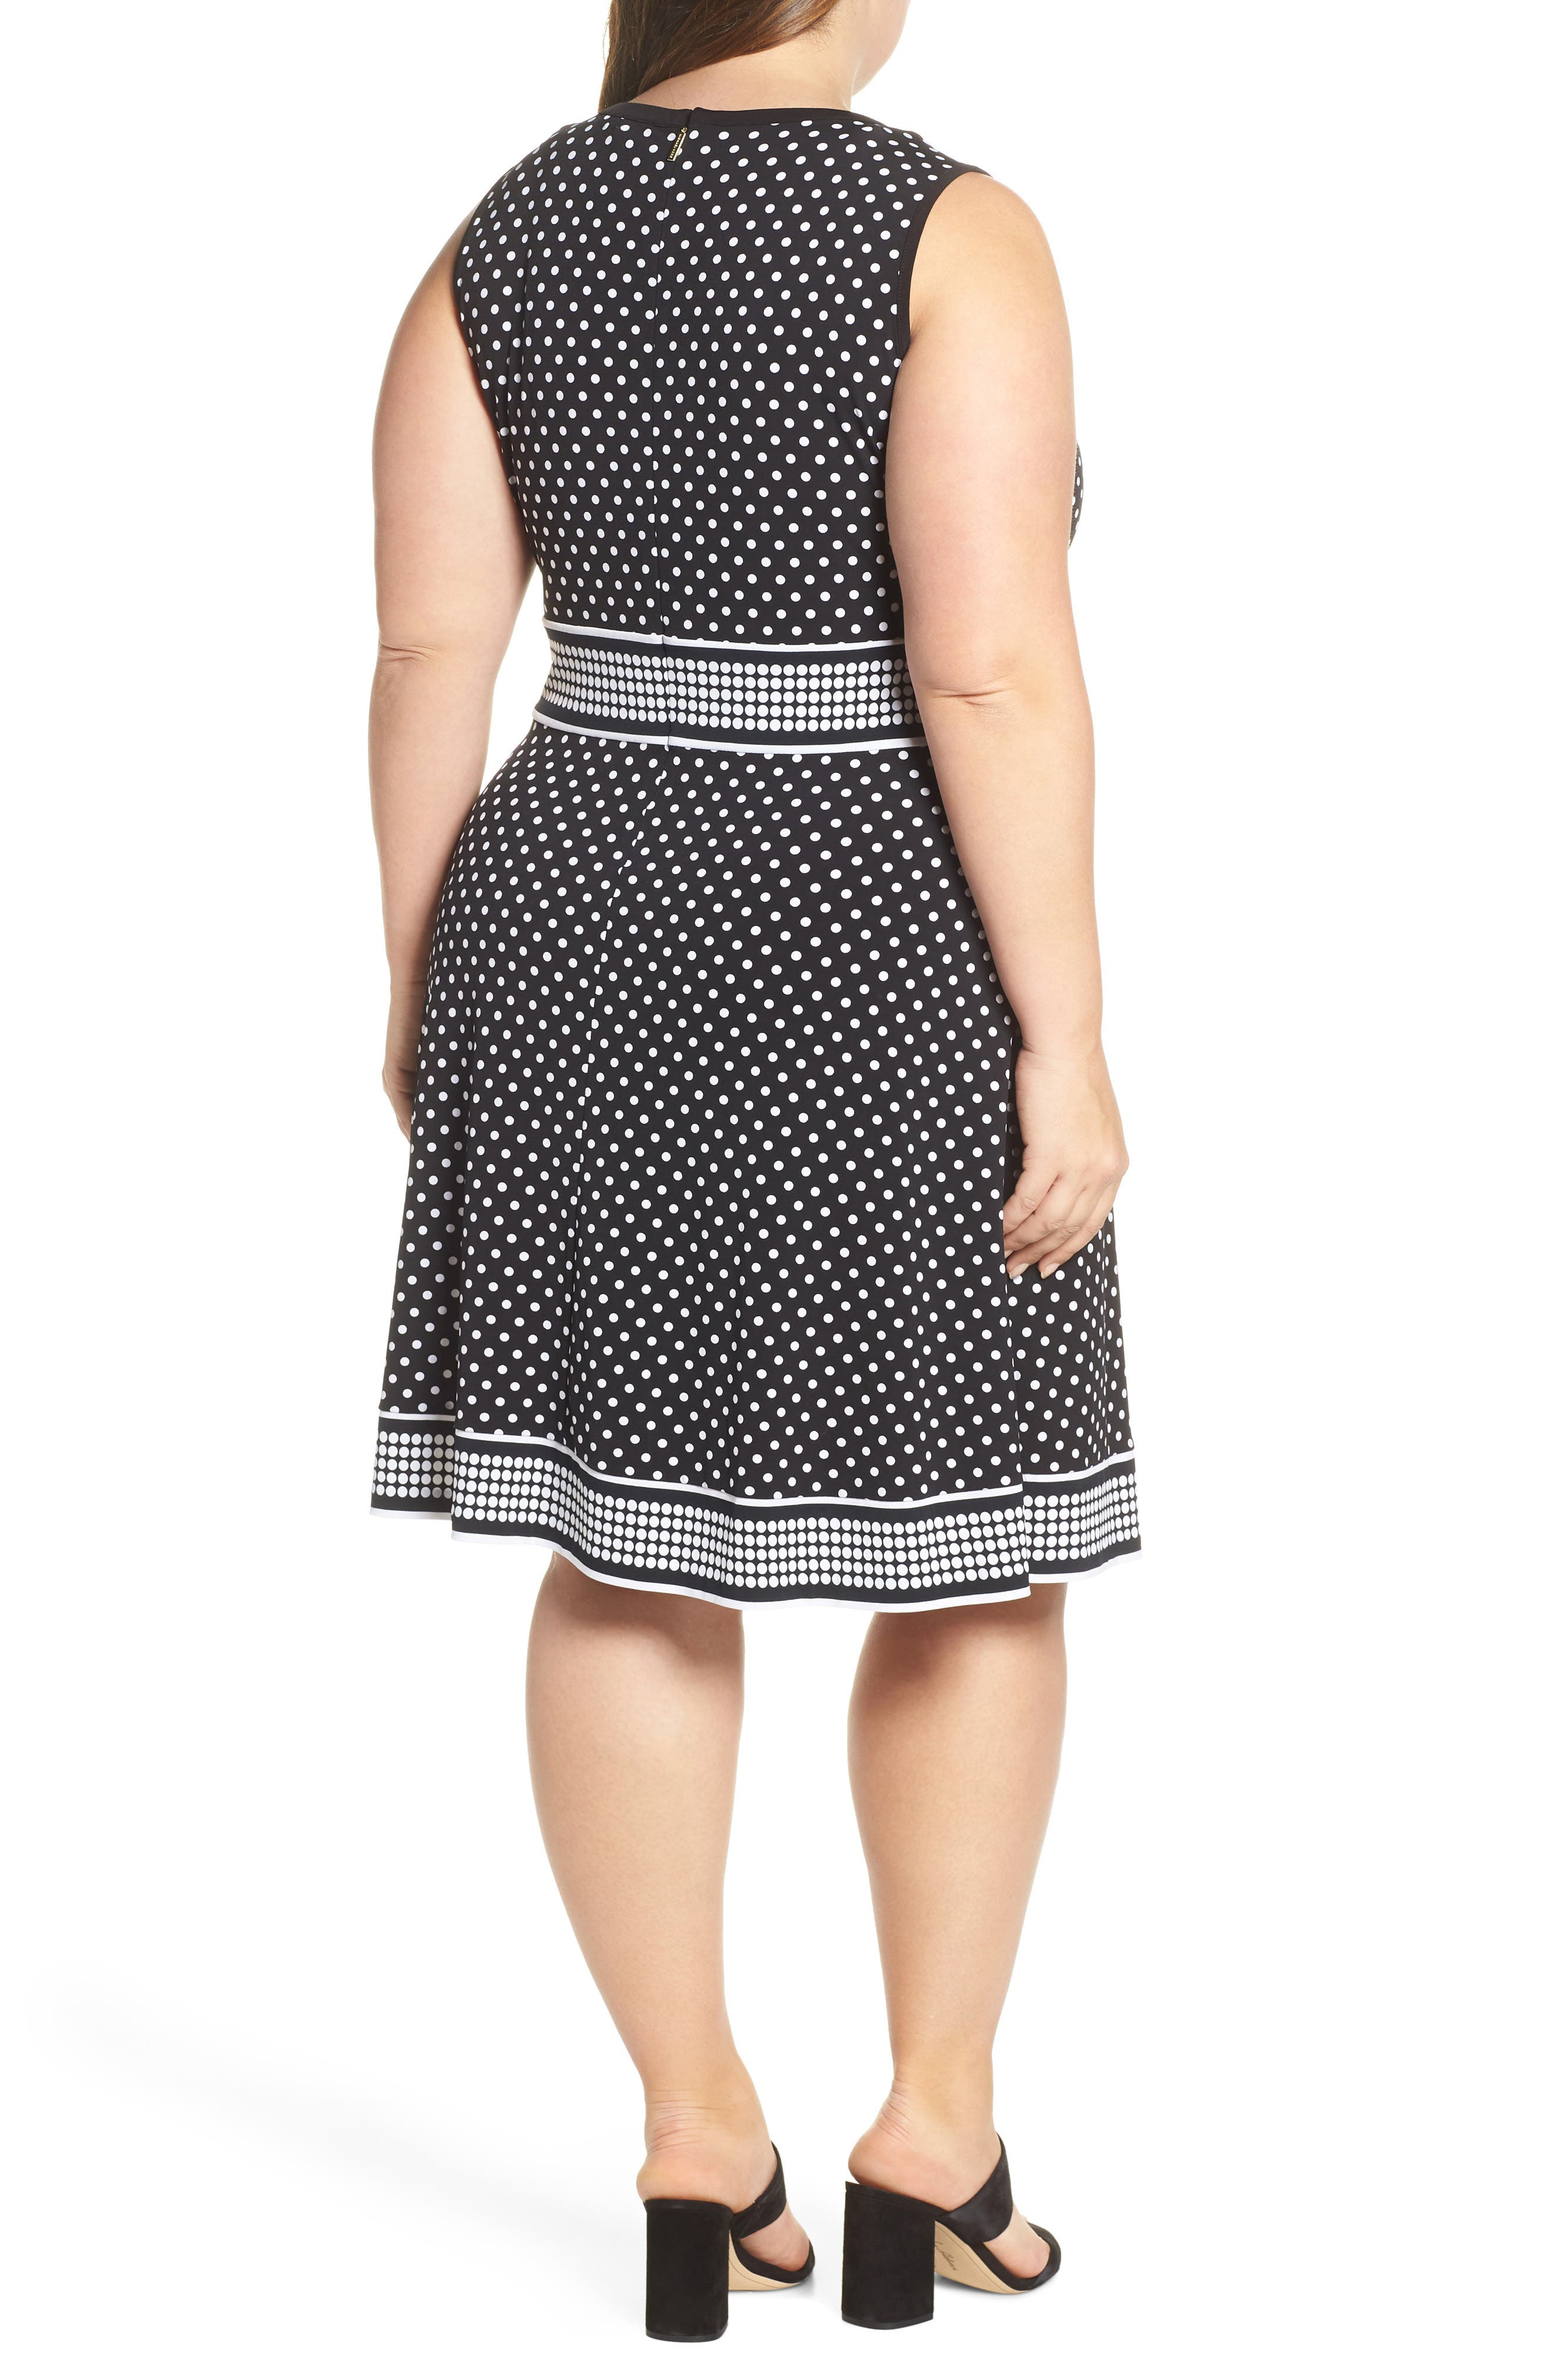 MICHAEL MICHAEL KORS, Mixed Polka Dot Dress, Alternate thumbnail 2, color, BLACK/ WHITE